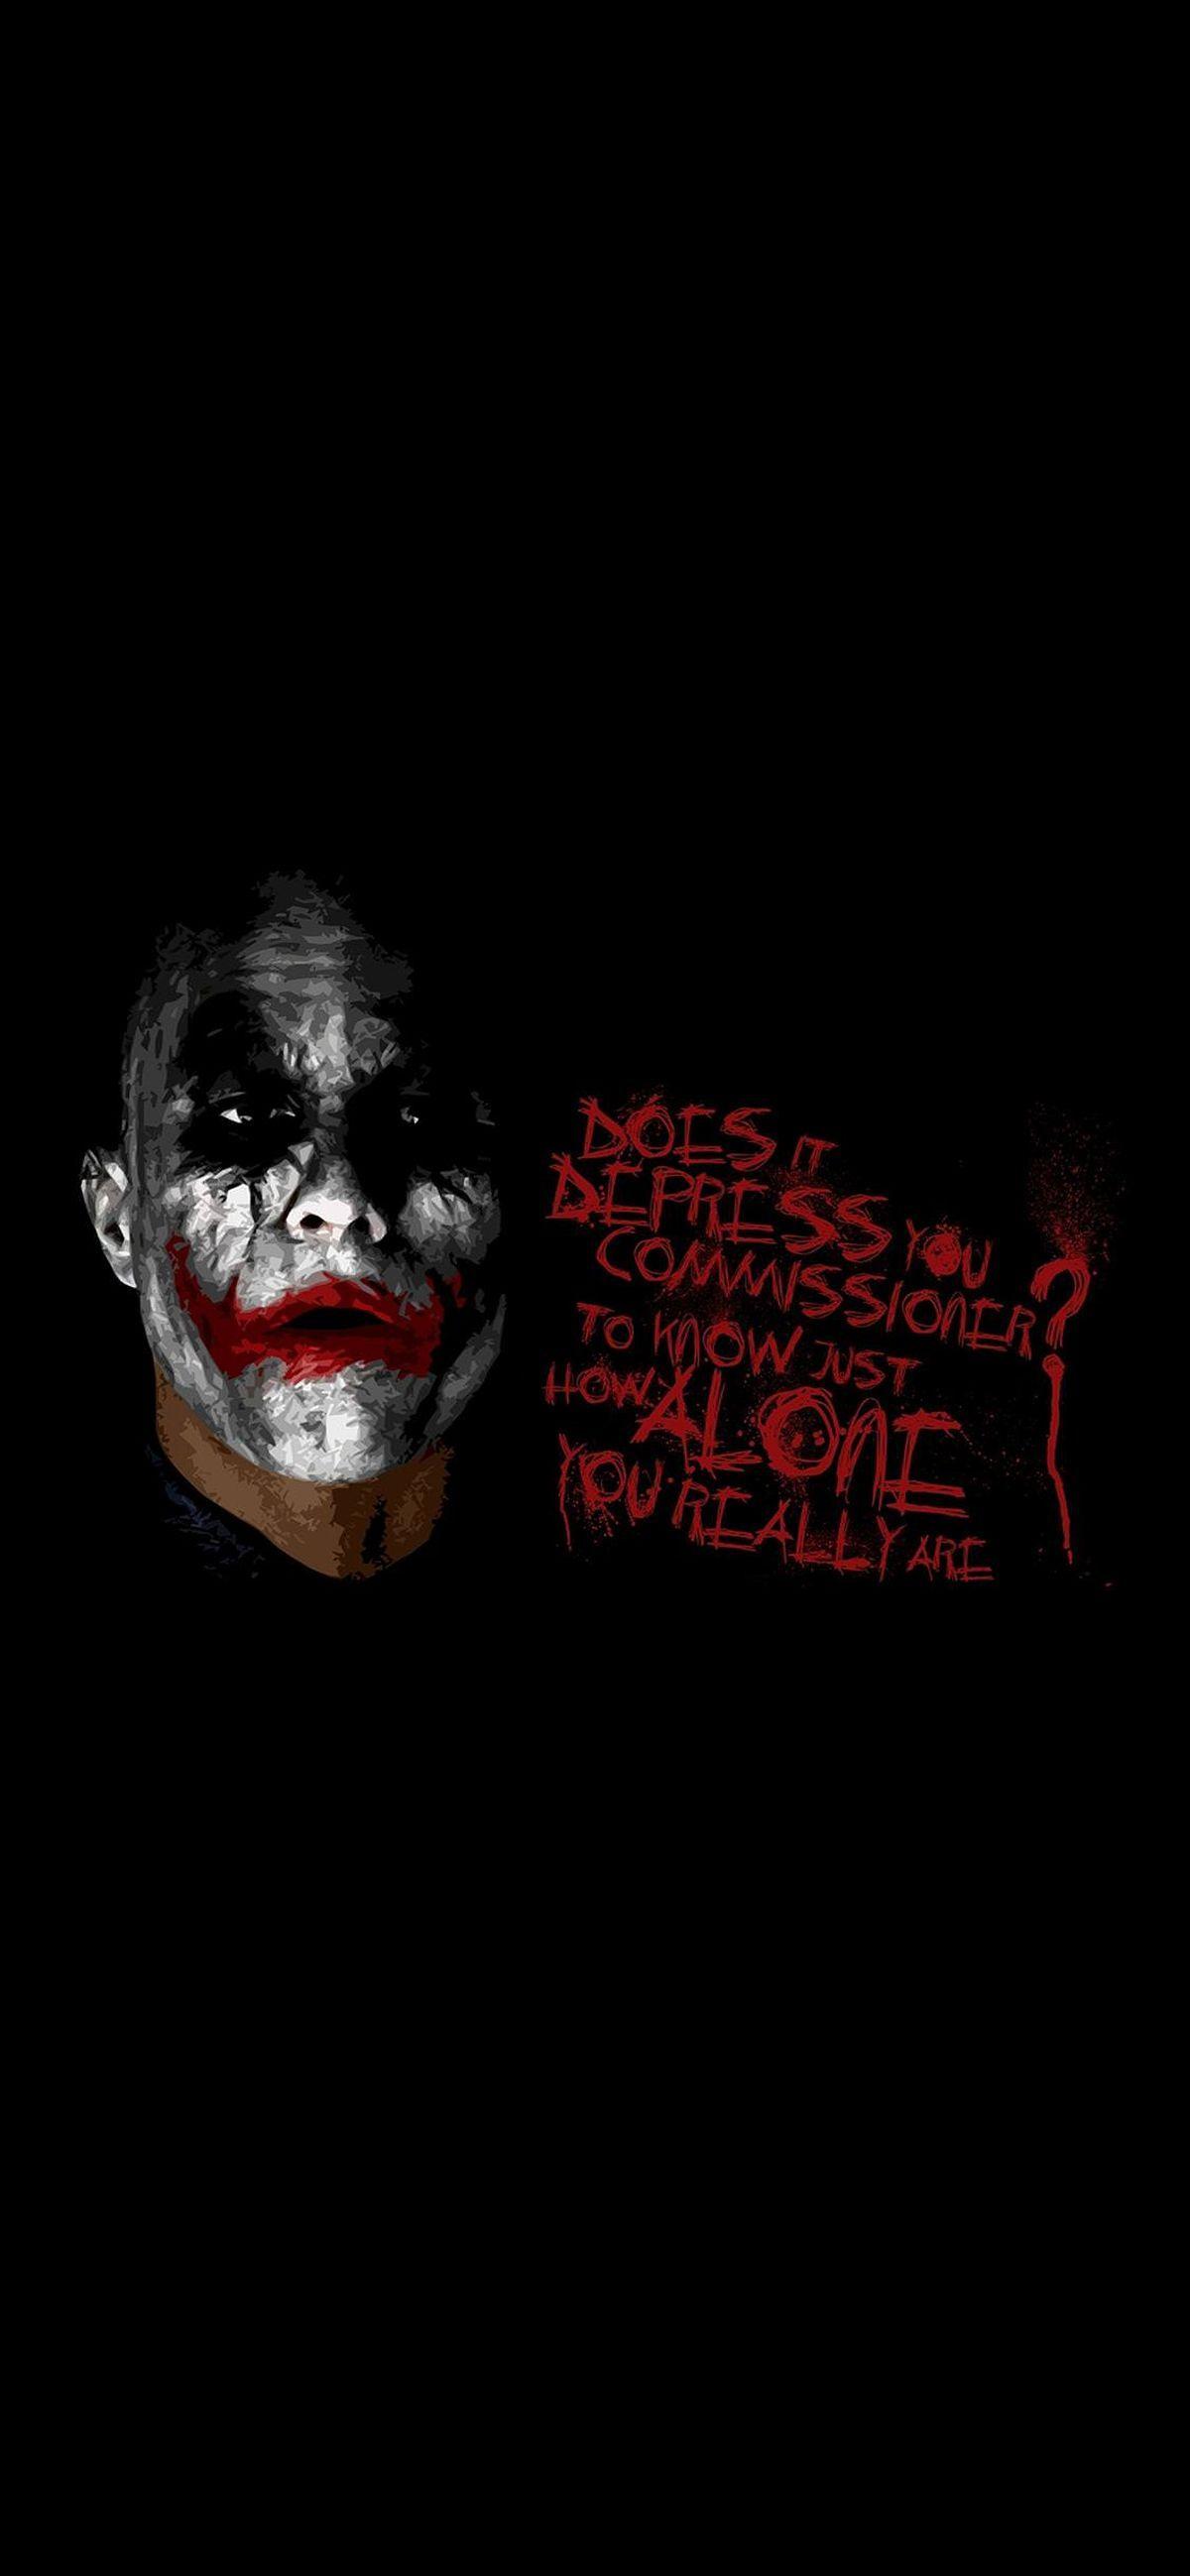 Iphone X Wallpapers 35 Great Images For An Amoled Screen Joker Wallpapers Joker Background Joker